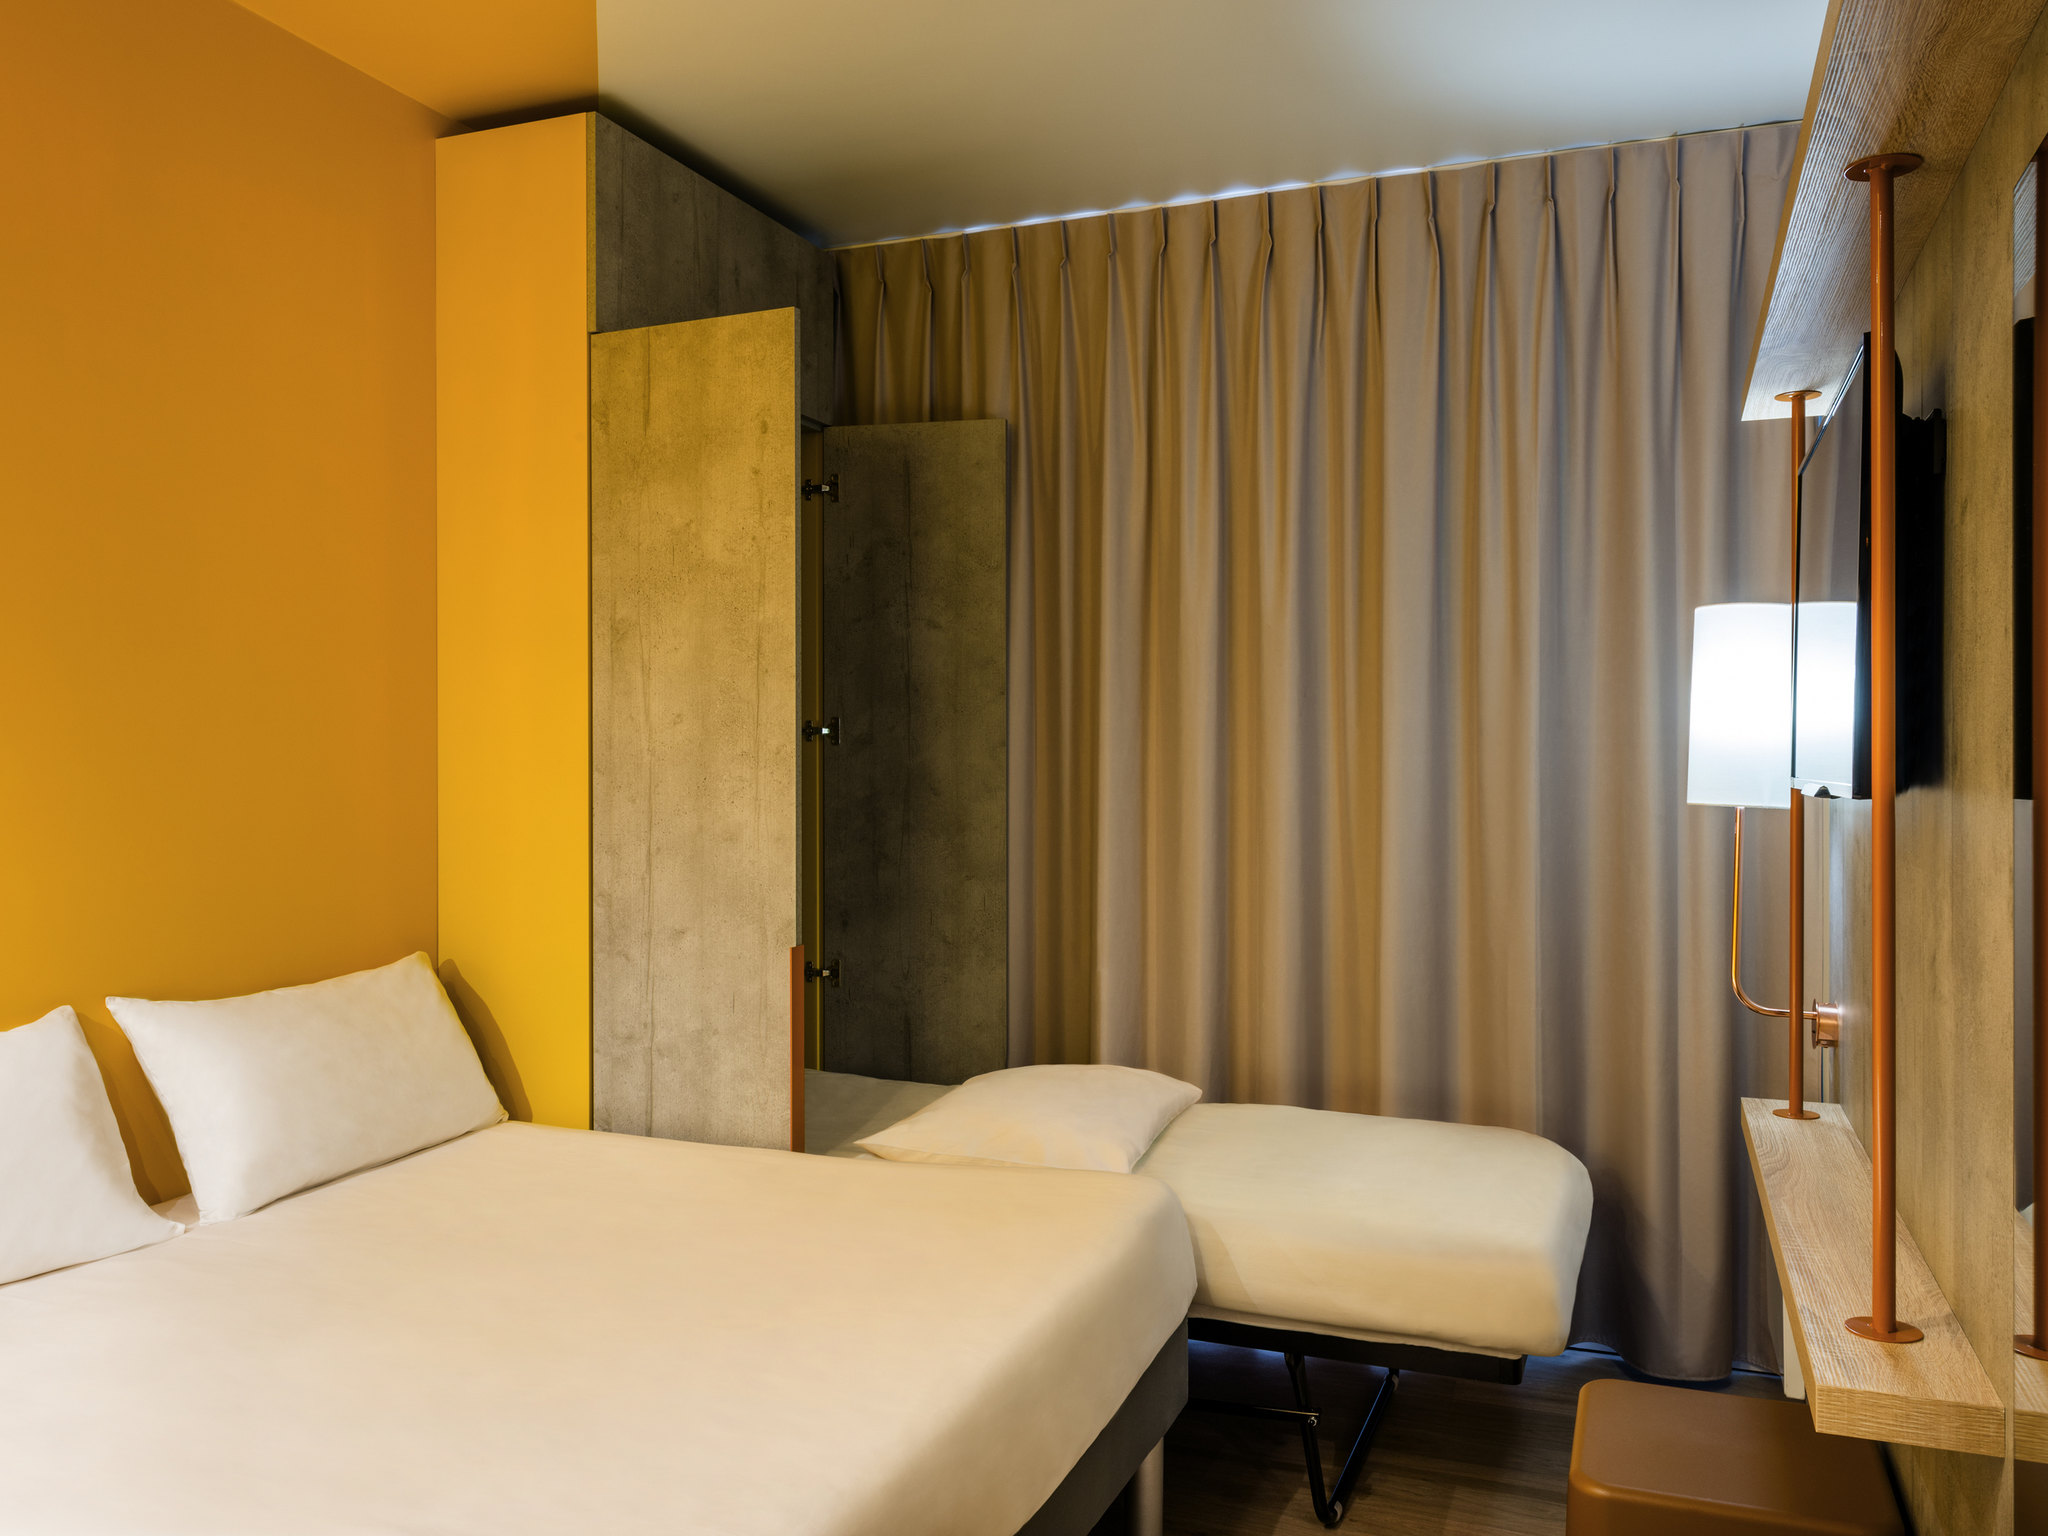 Hotel Ibis Fecamp Tarif